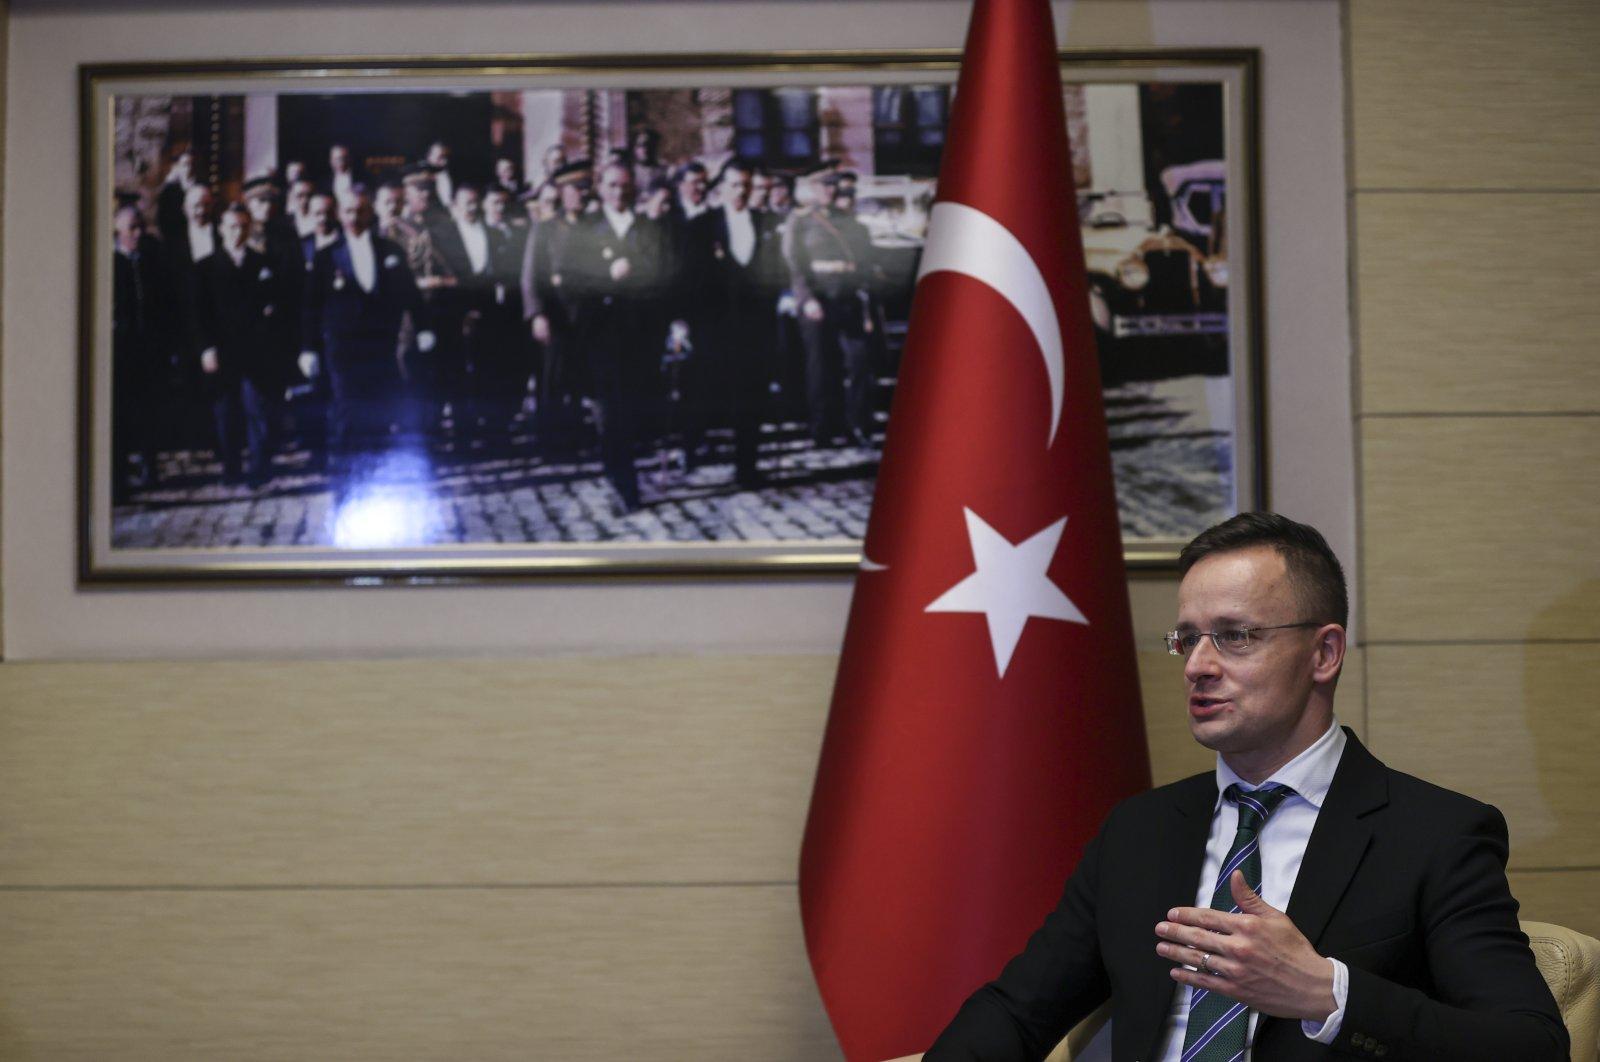 Hungary's Foreign Minister Peter Szijjarto speaks to the Anadolu Agency (AA) in the capital Ankara, Turkey, Dec. 9, 2020. (AA Photo)